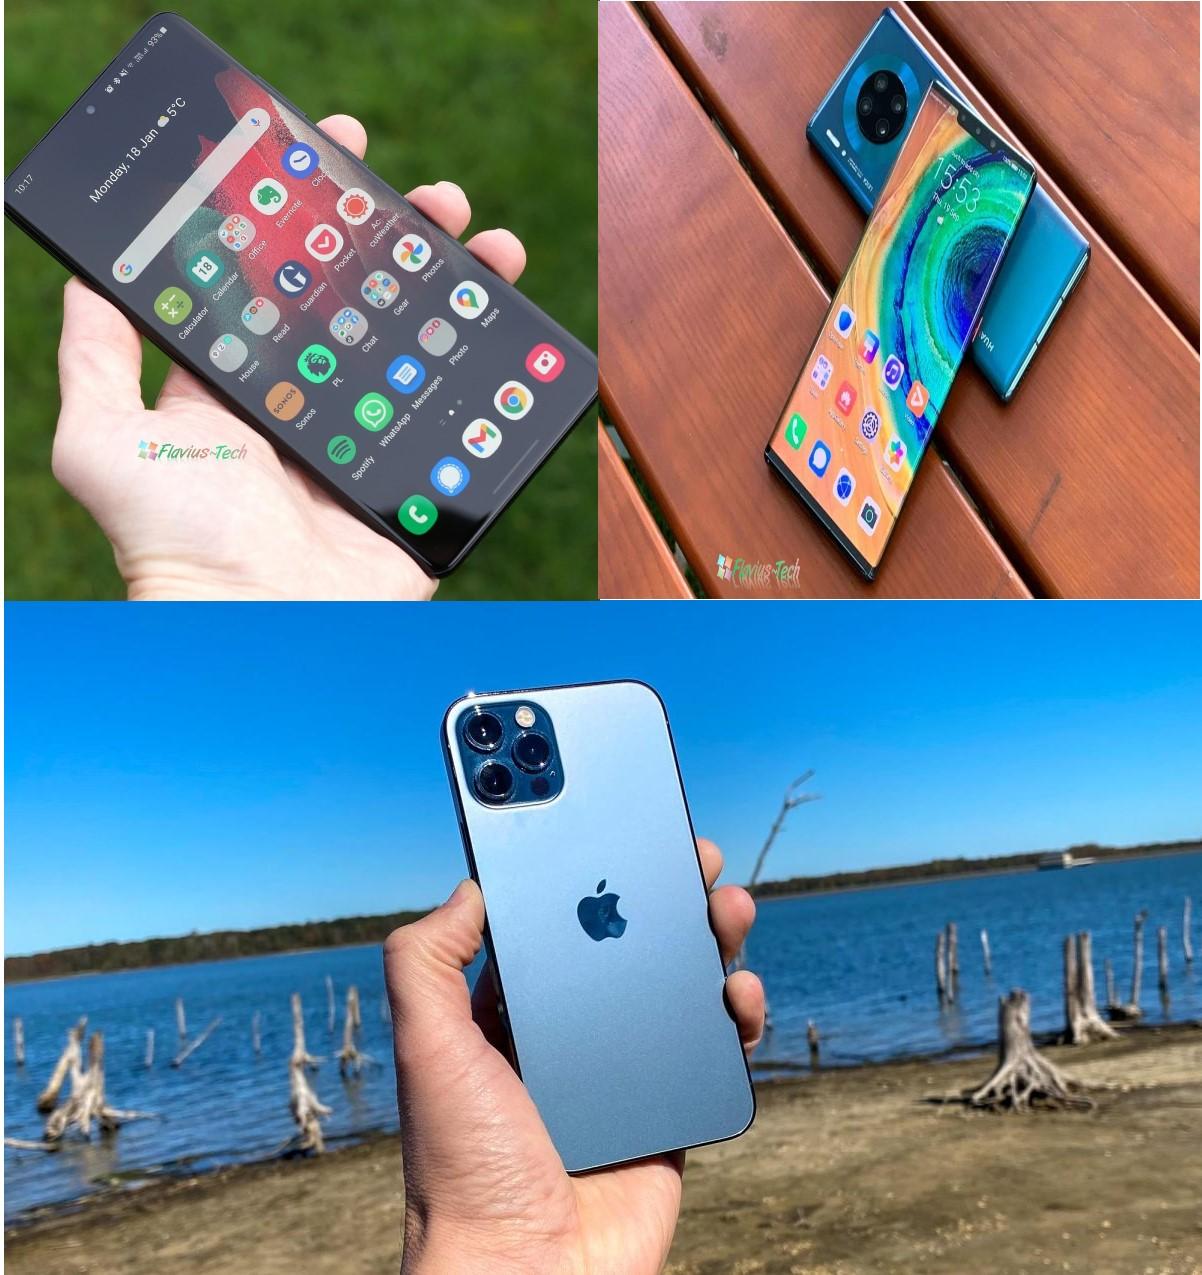 ce telefon sa cumpar?